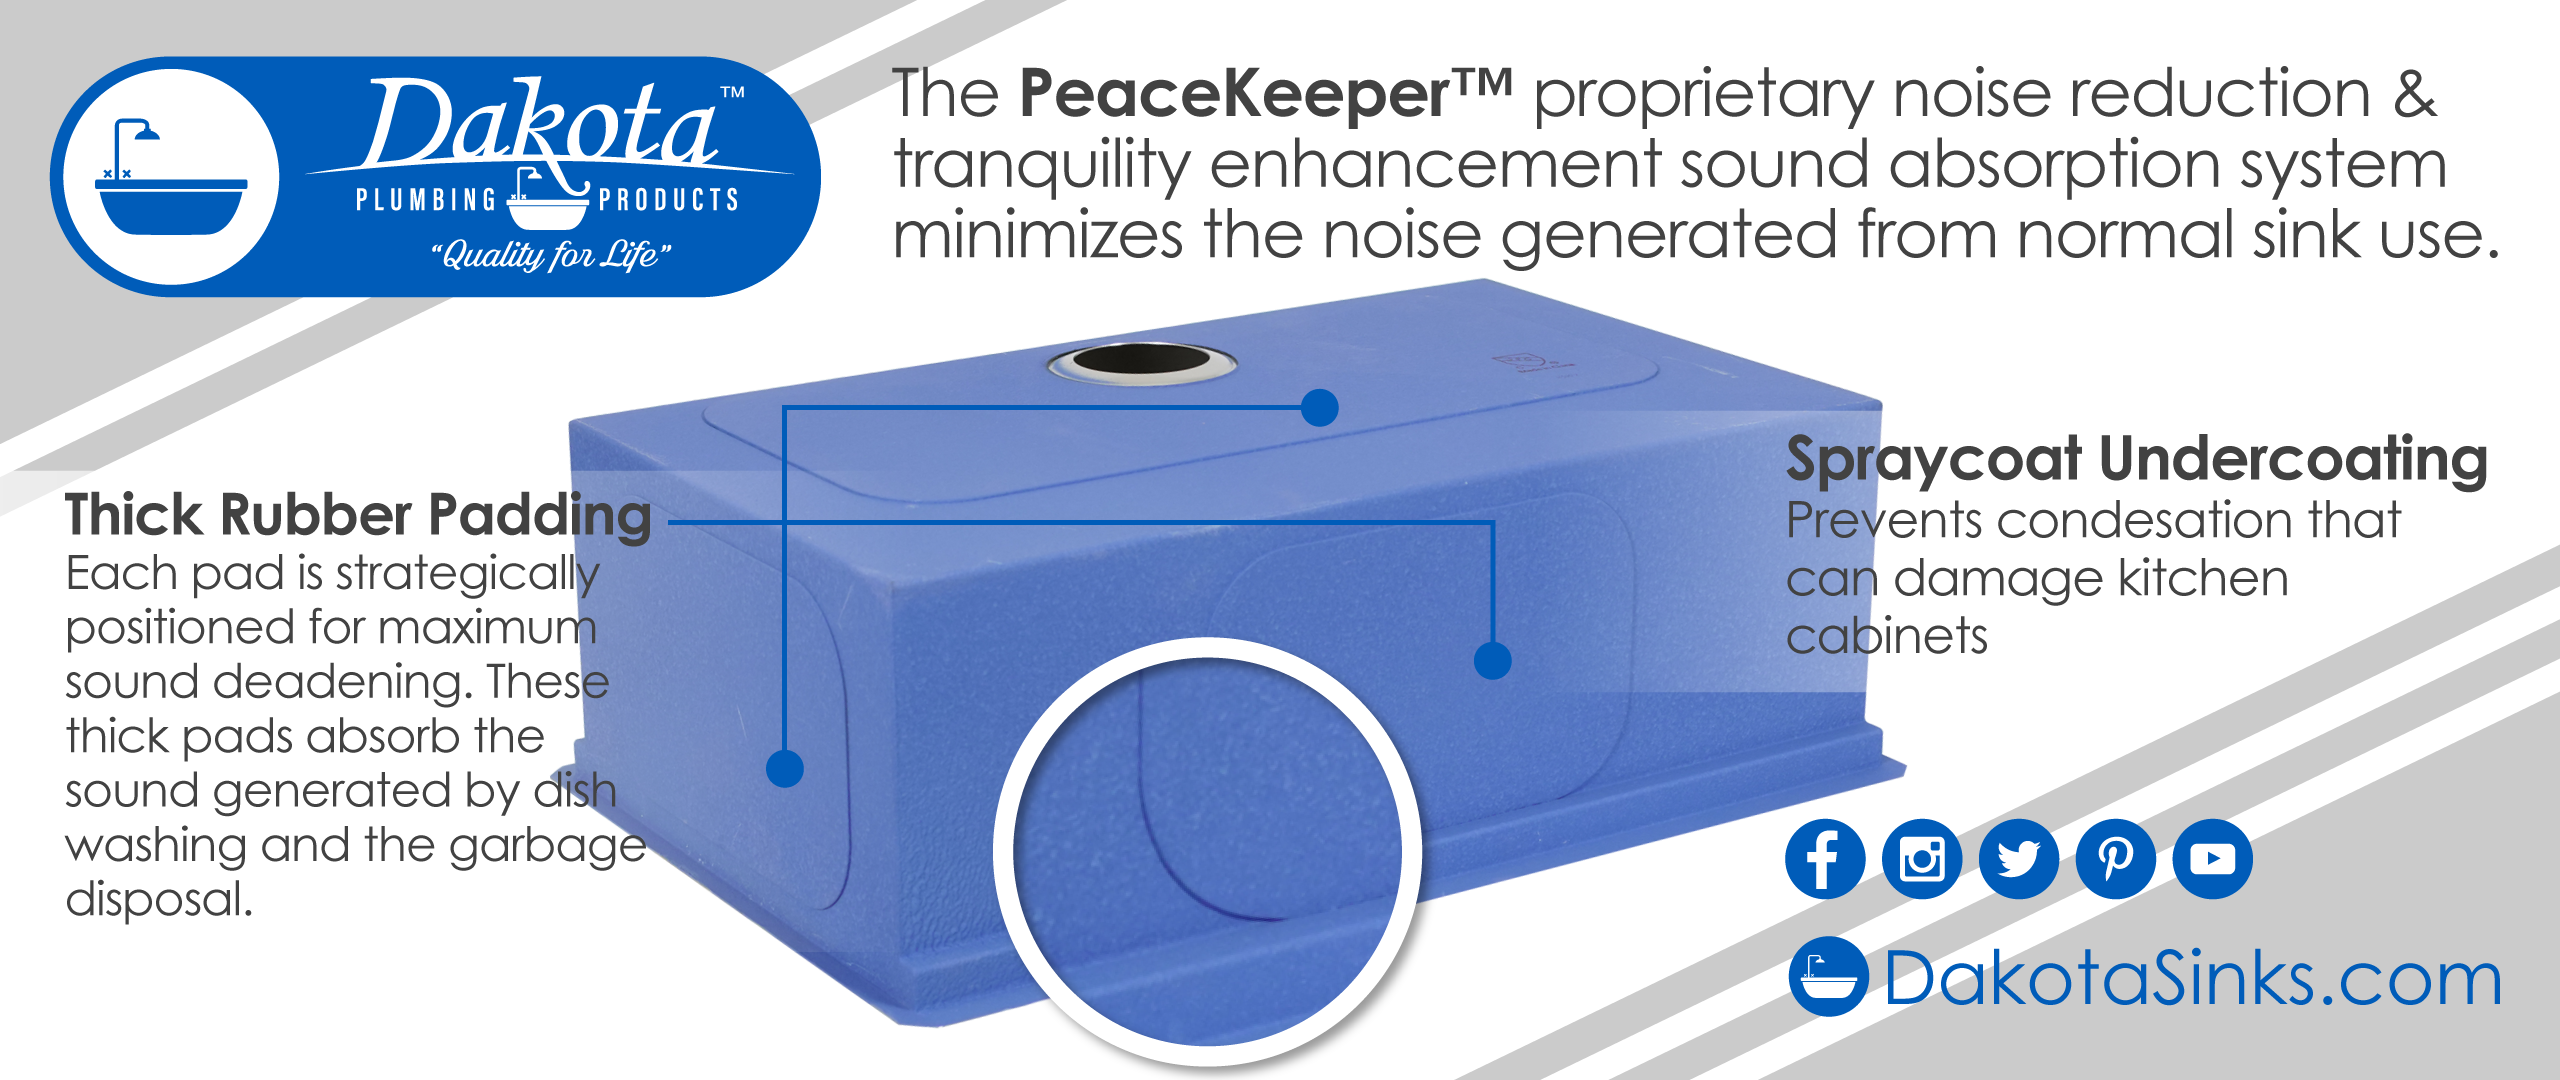 PeaceKeeper Info Image